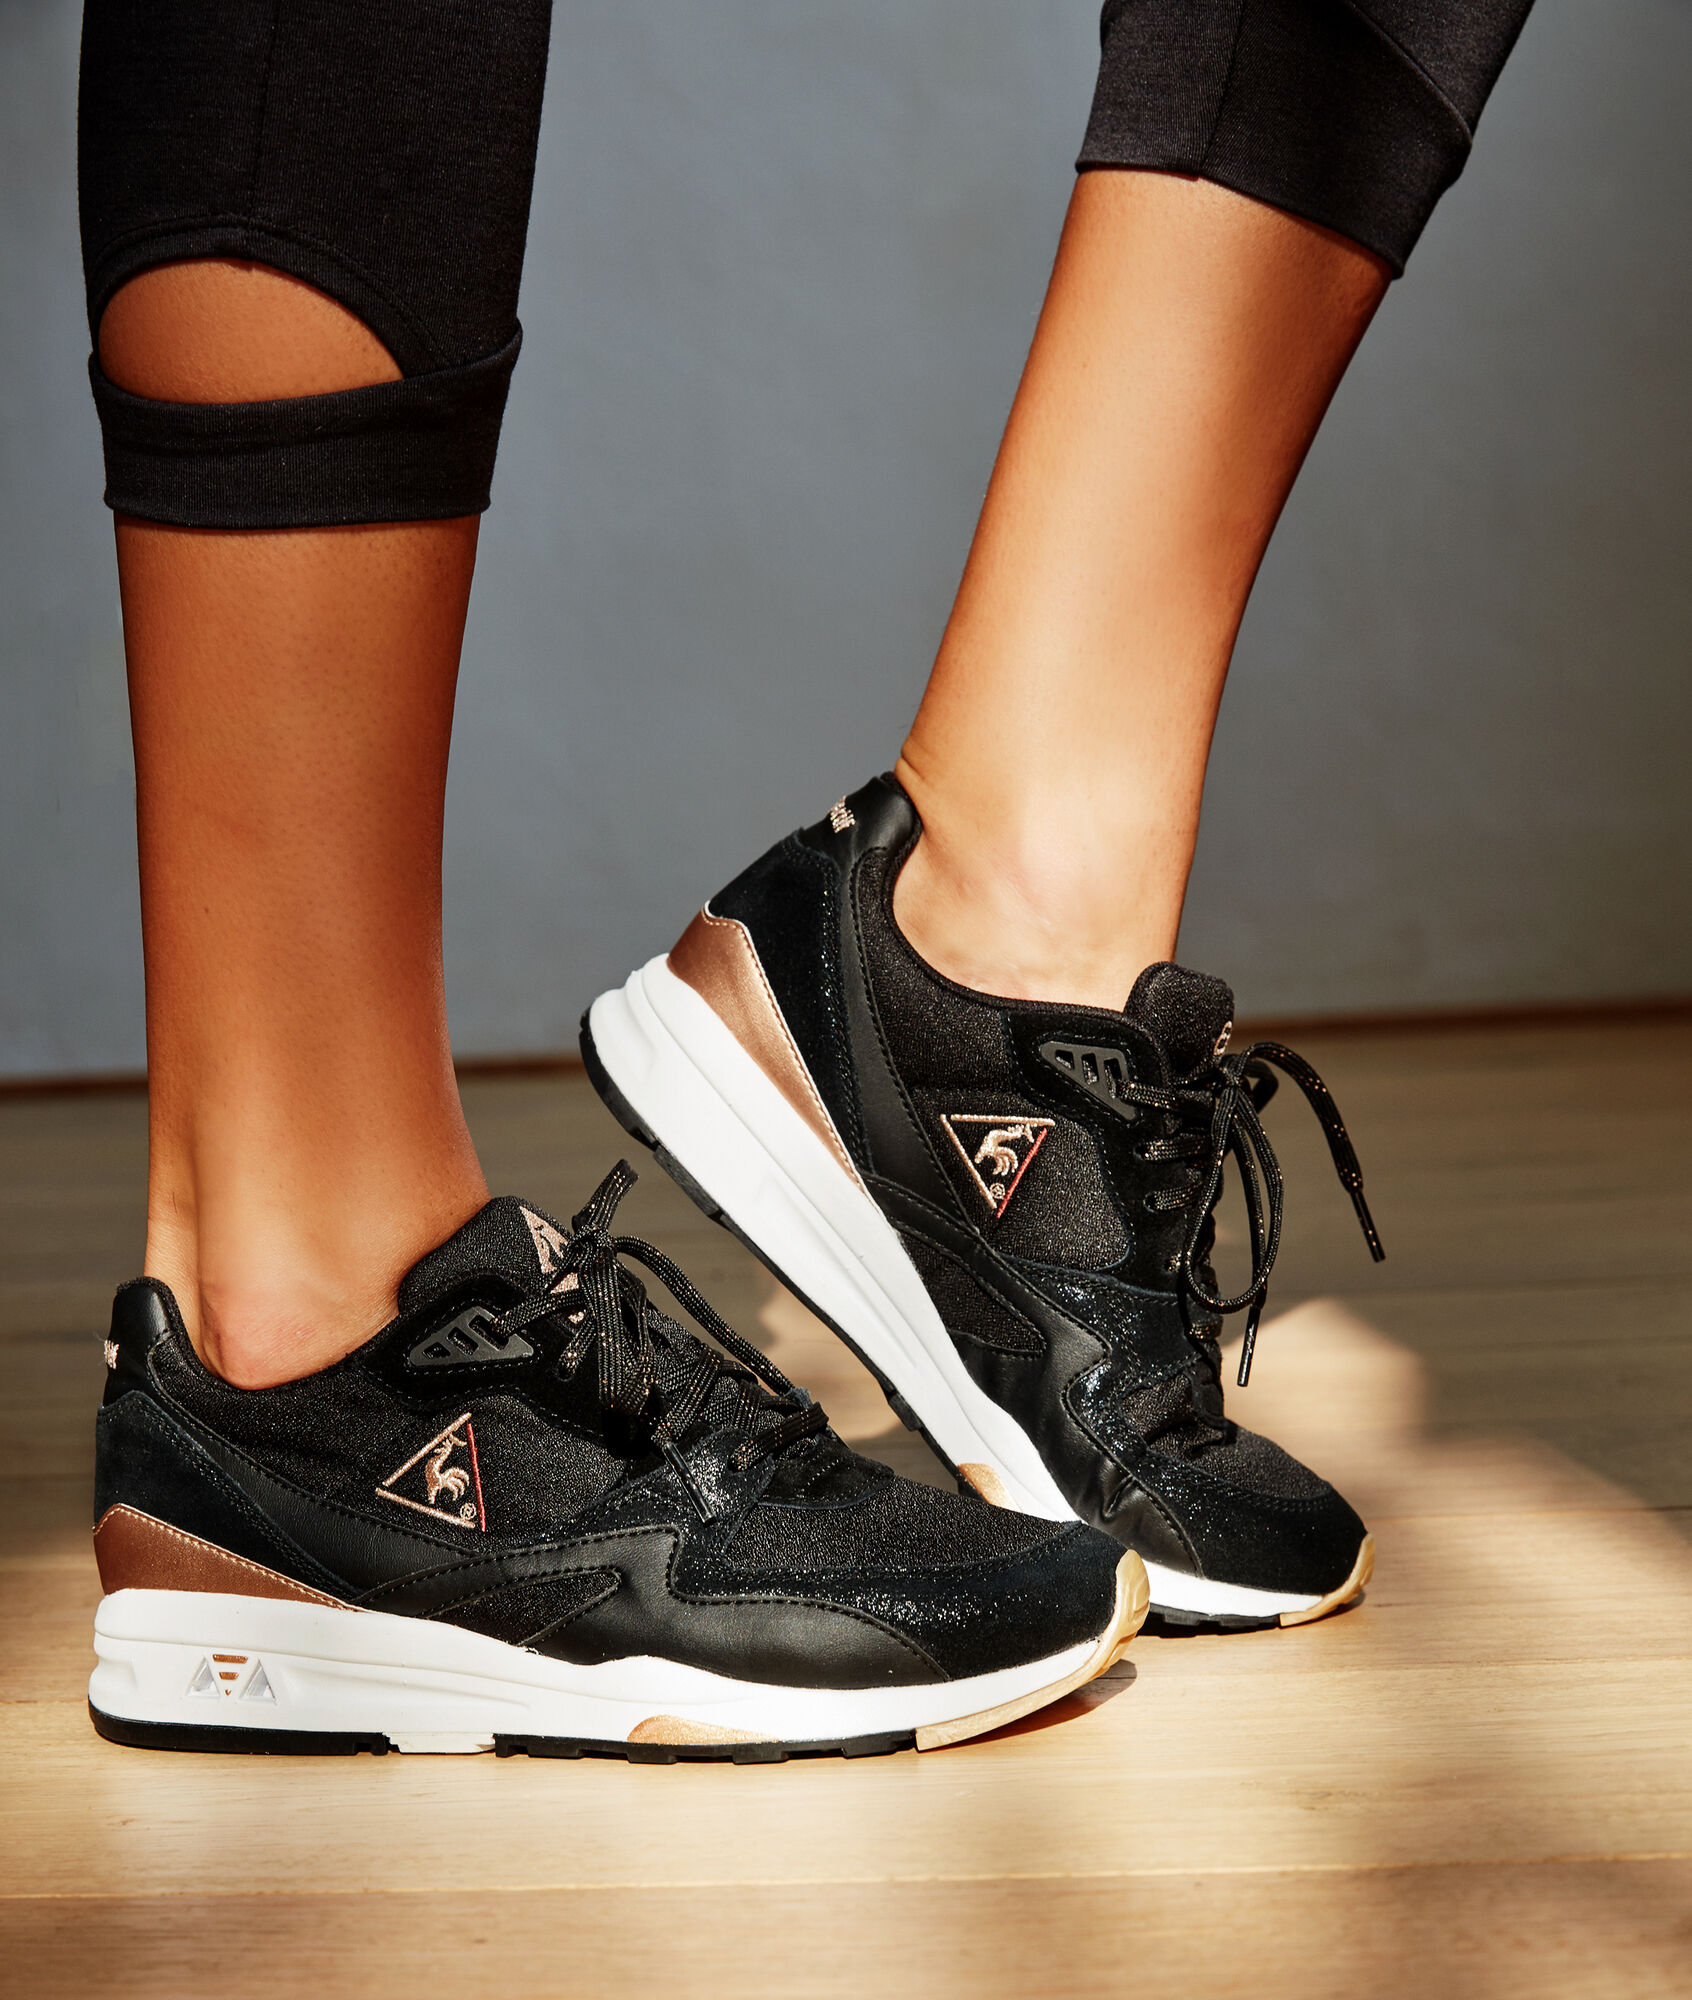 8c07cc039a9f Le coq sportif x etam sneakers - Etam